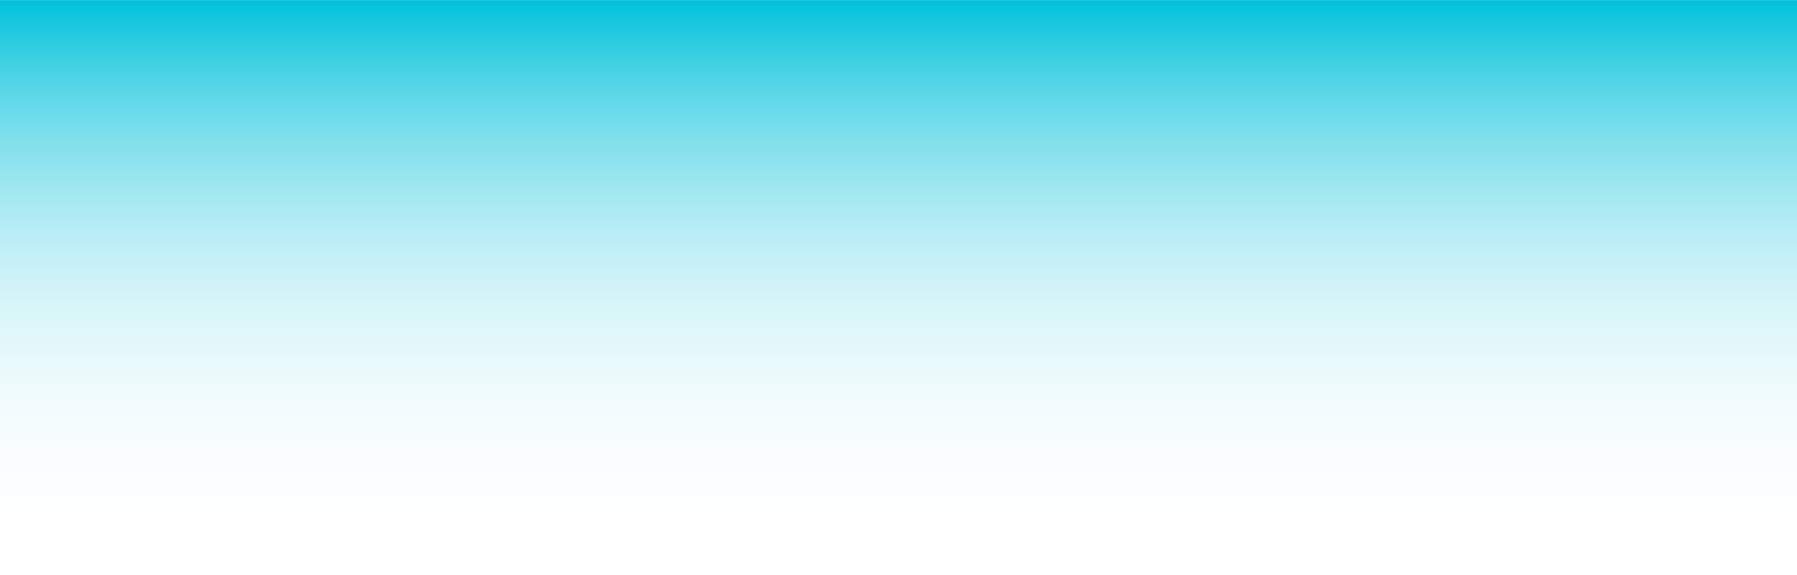 2021 FG_WEBSITE_background_gradient_2-16_edited.png